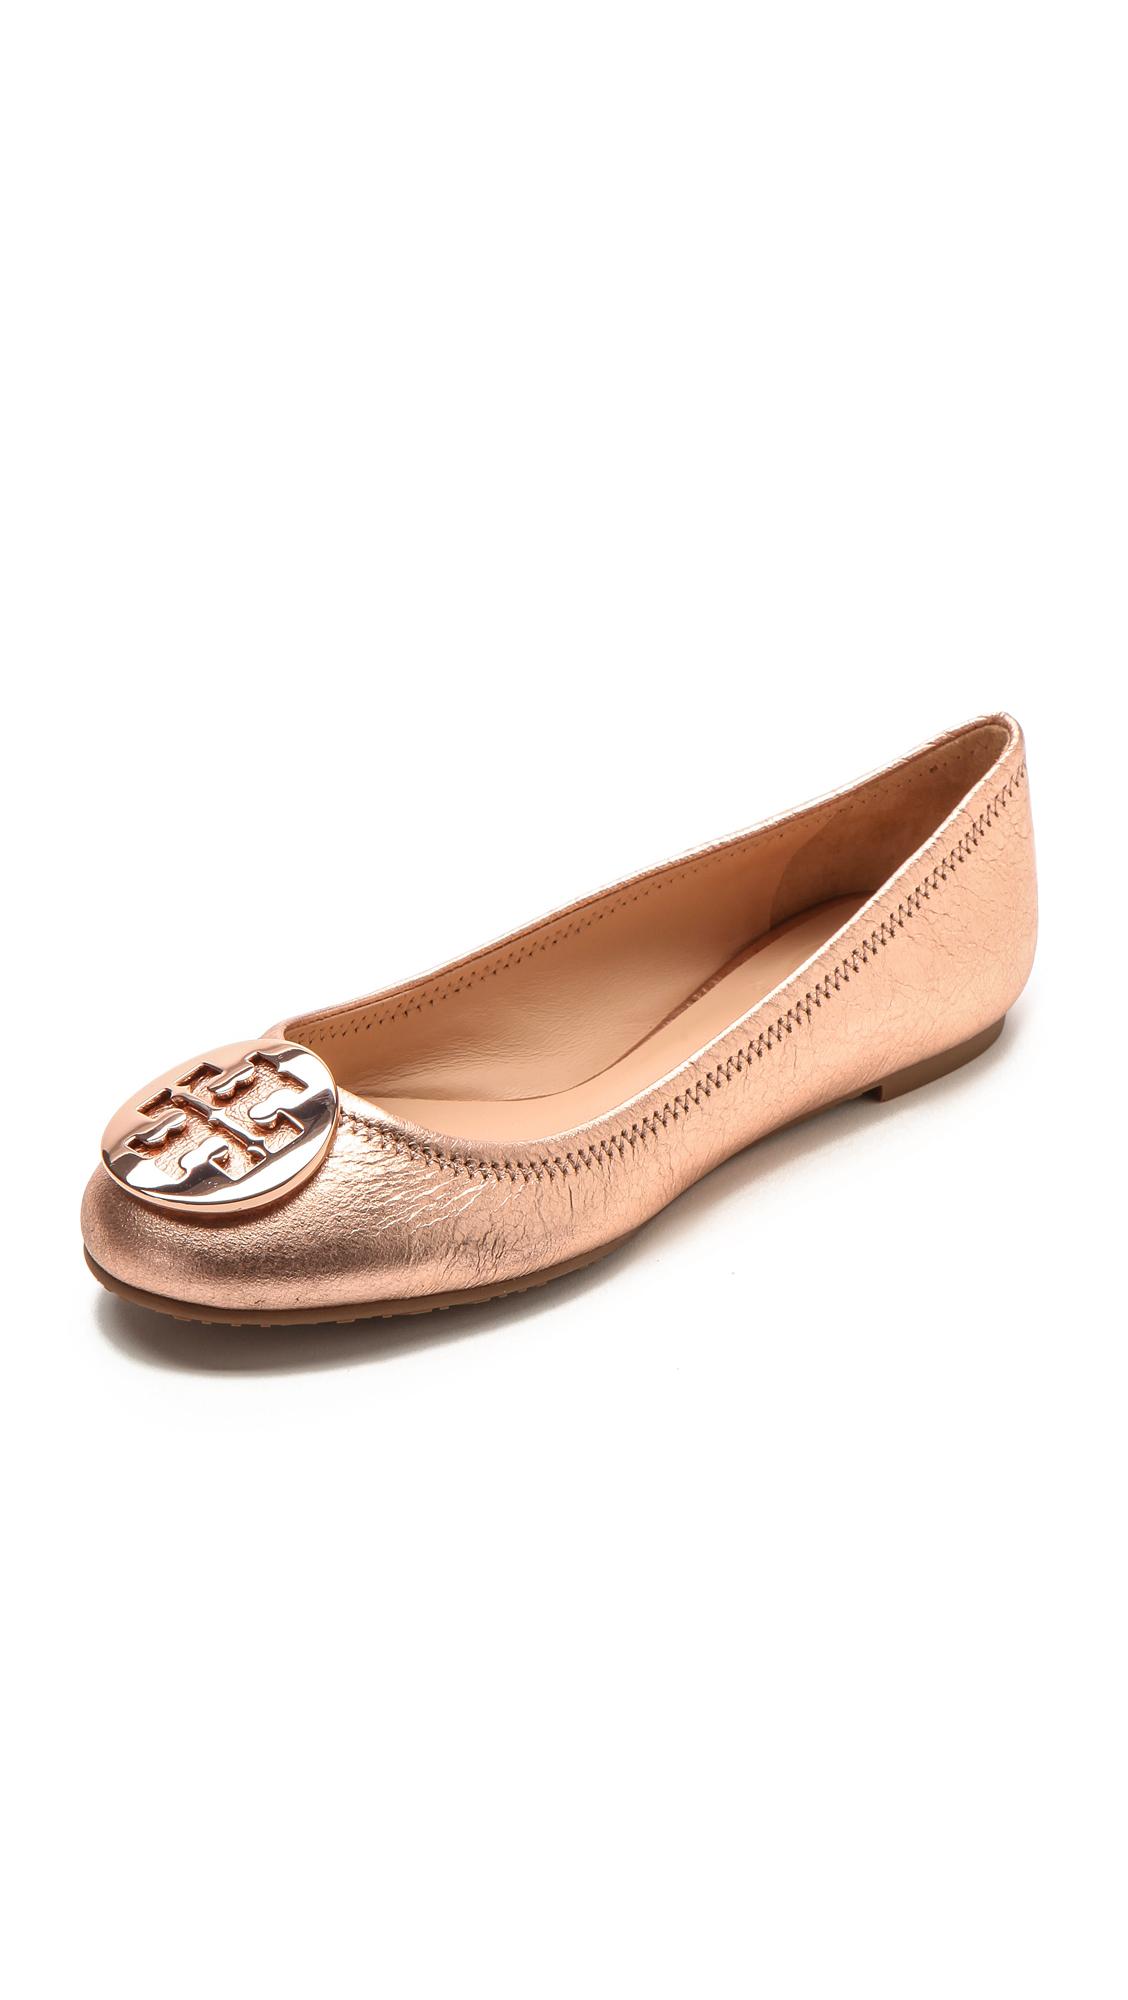 2c685687e ... hot lyst tory burch reva ballet flats rose gold in pink 6f39a 9750a